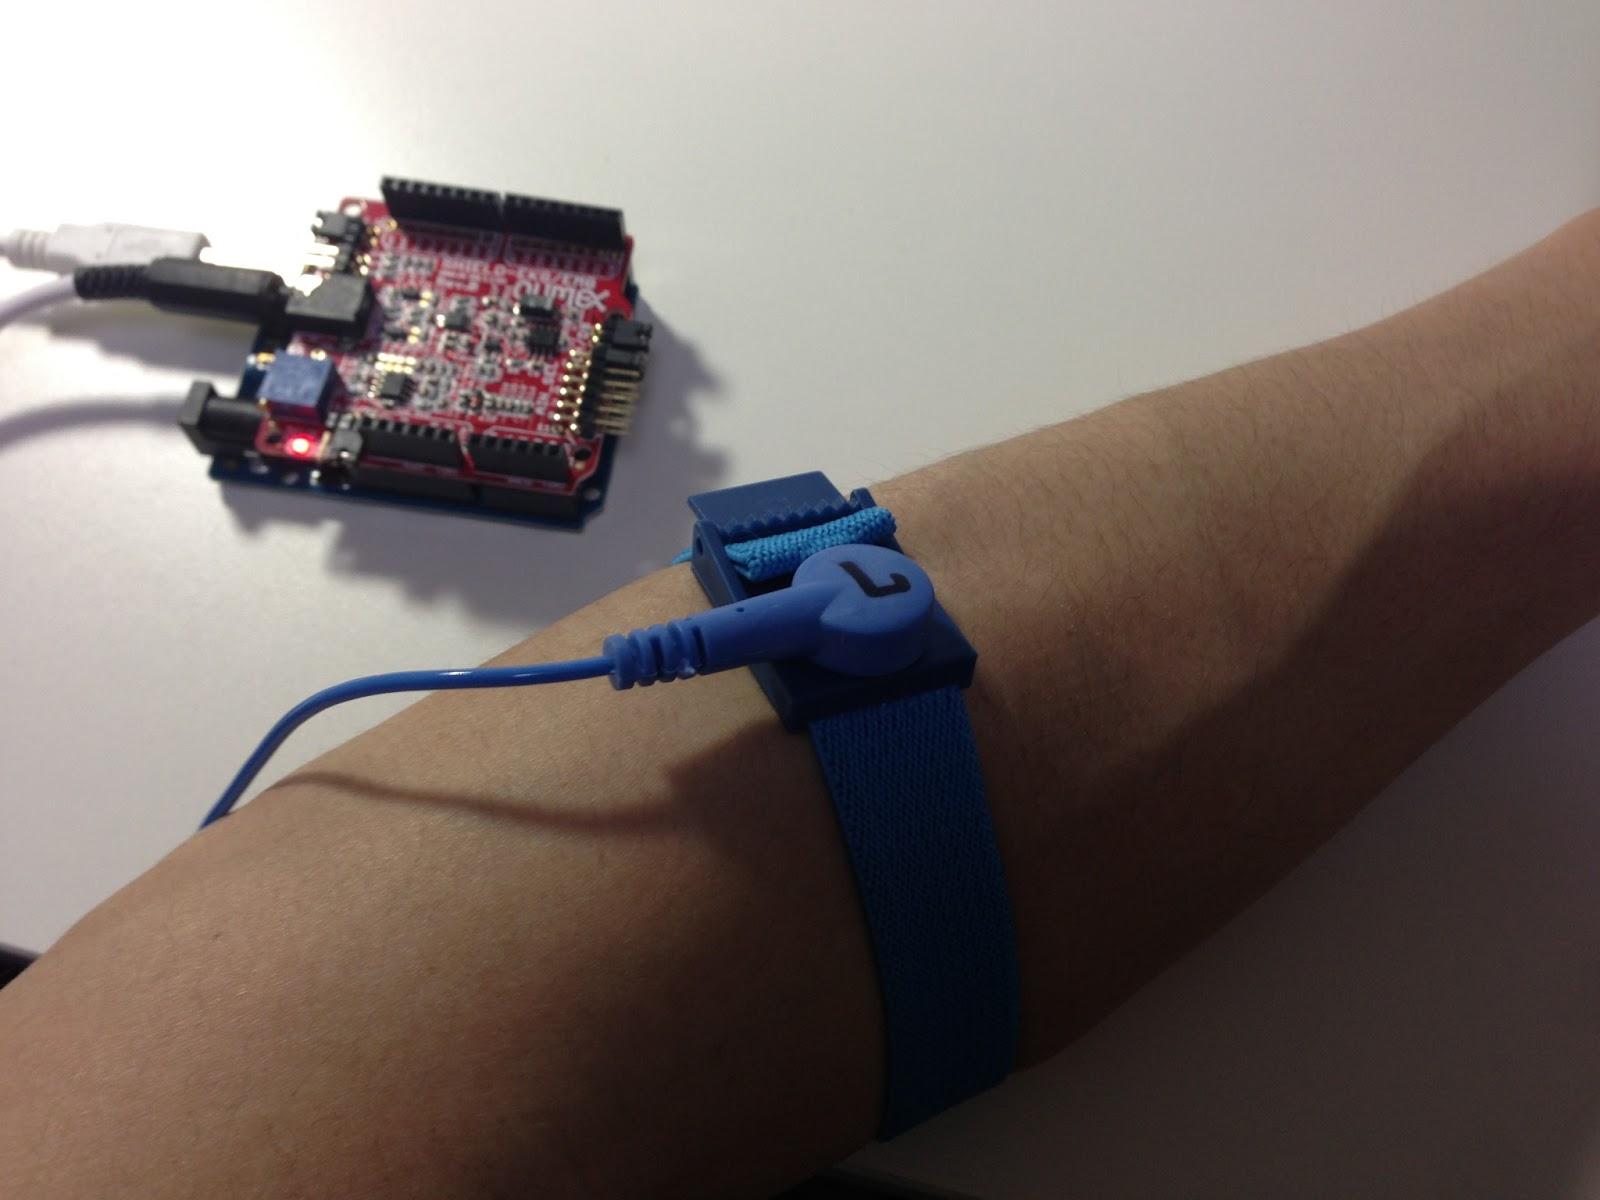 Shield Ekg Emg Pa Pro Arduino Ecg Heart Rate Monitor Circuit Prototype Youtube